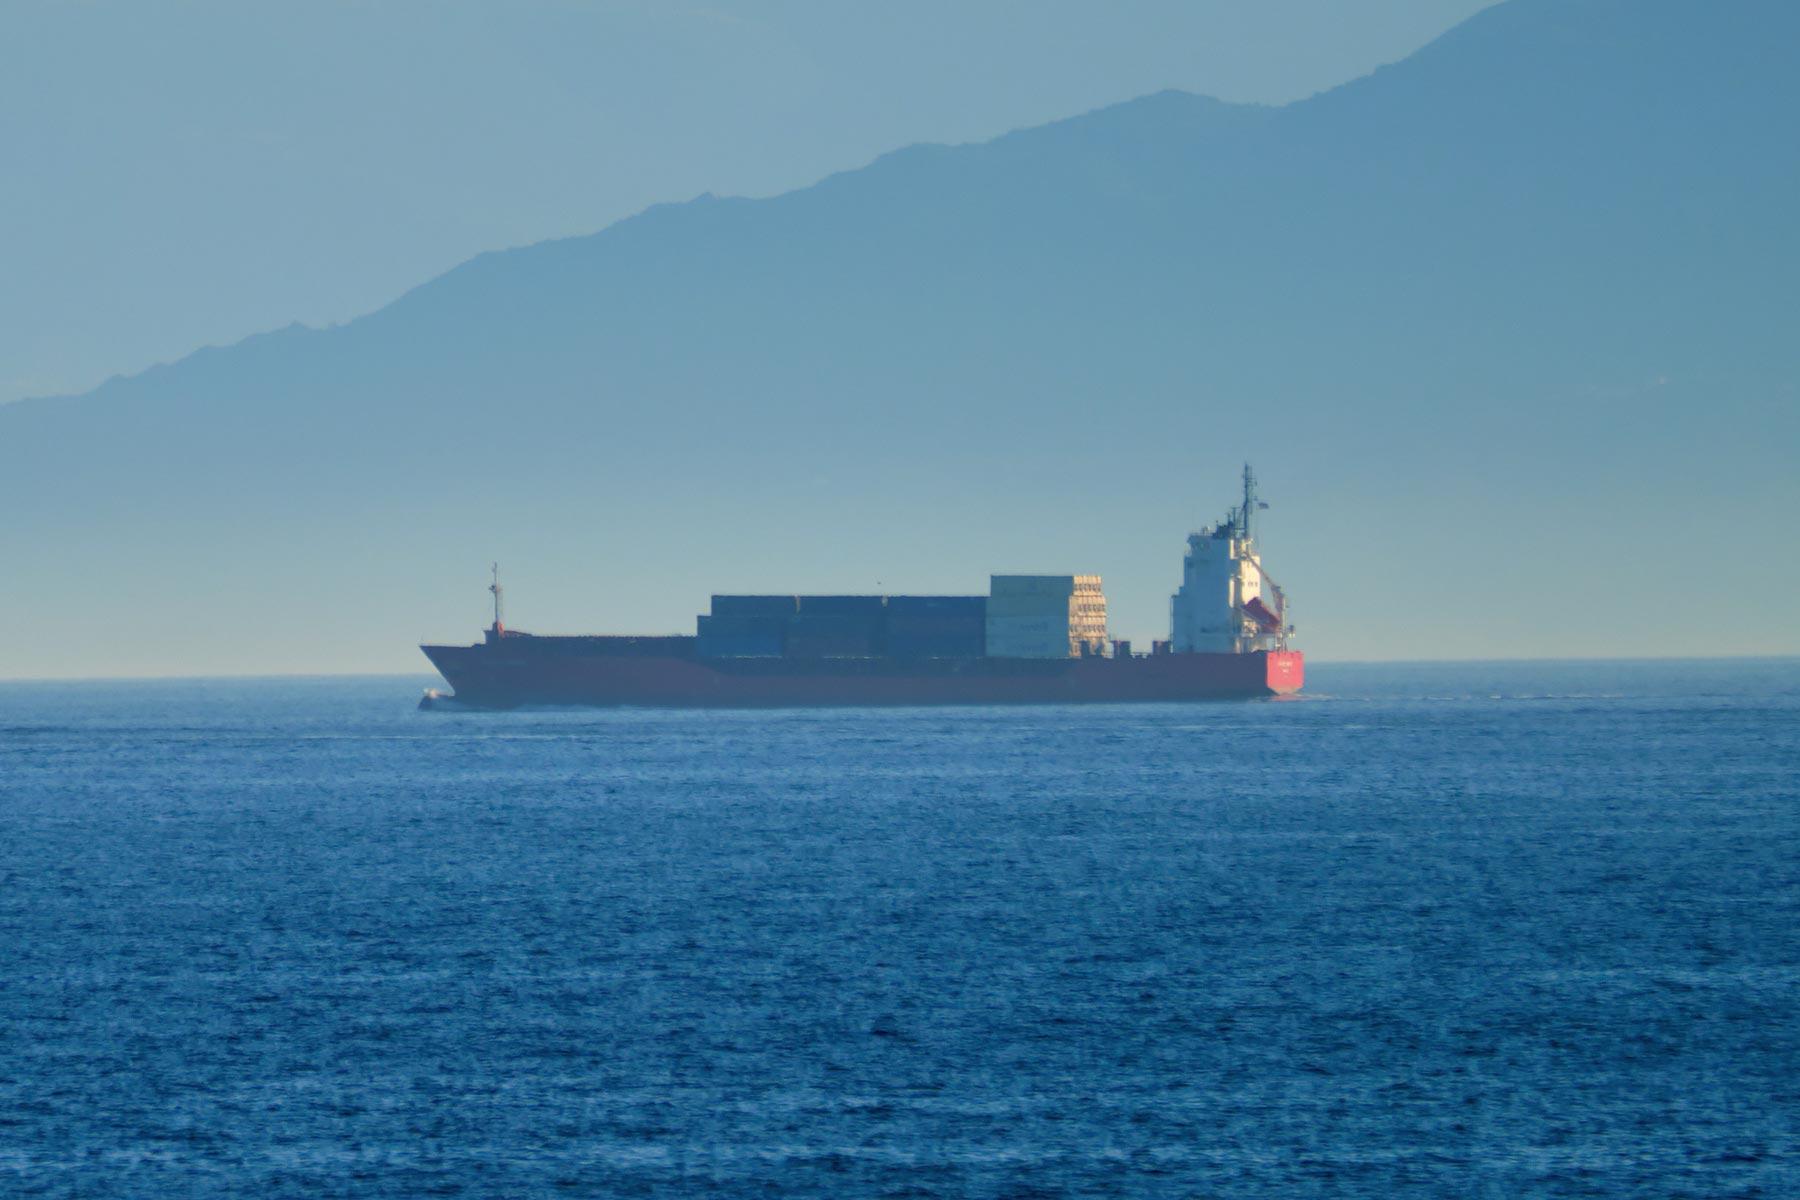 Maritime & Land Security Insurance